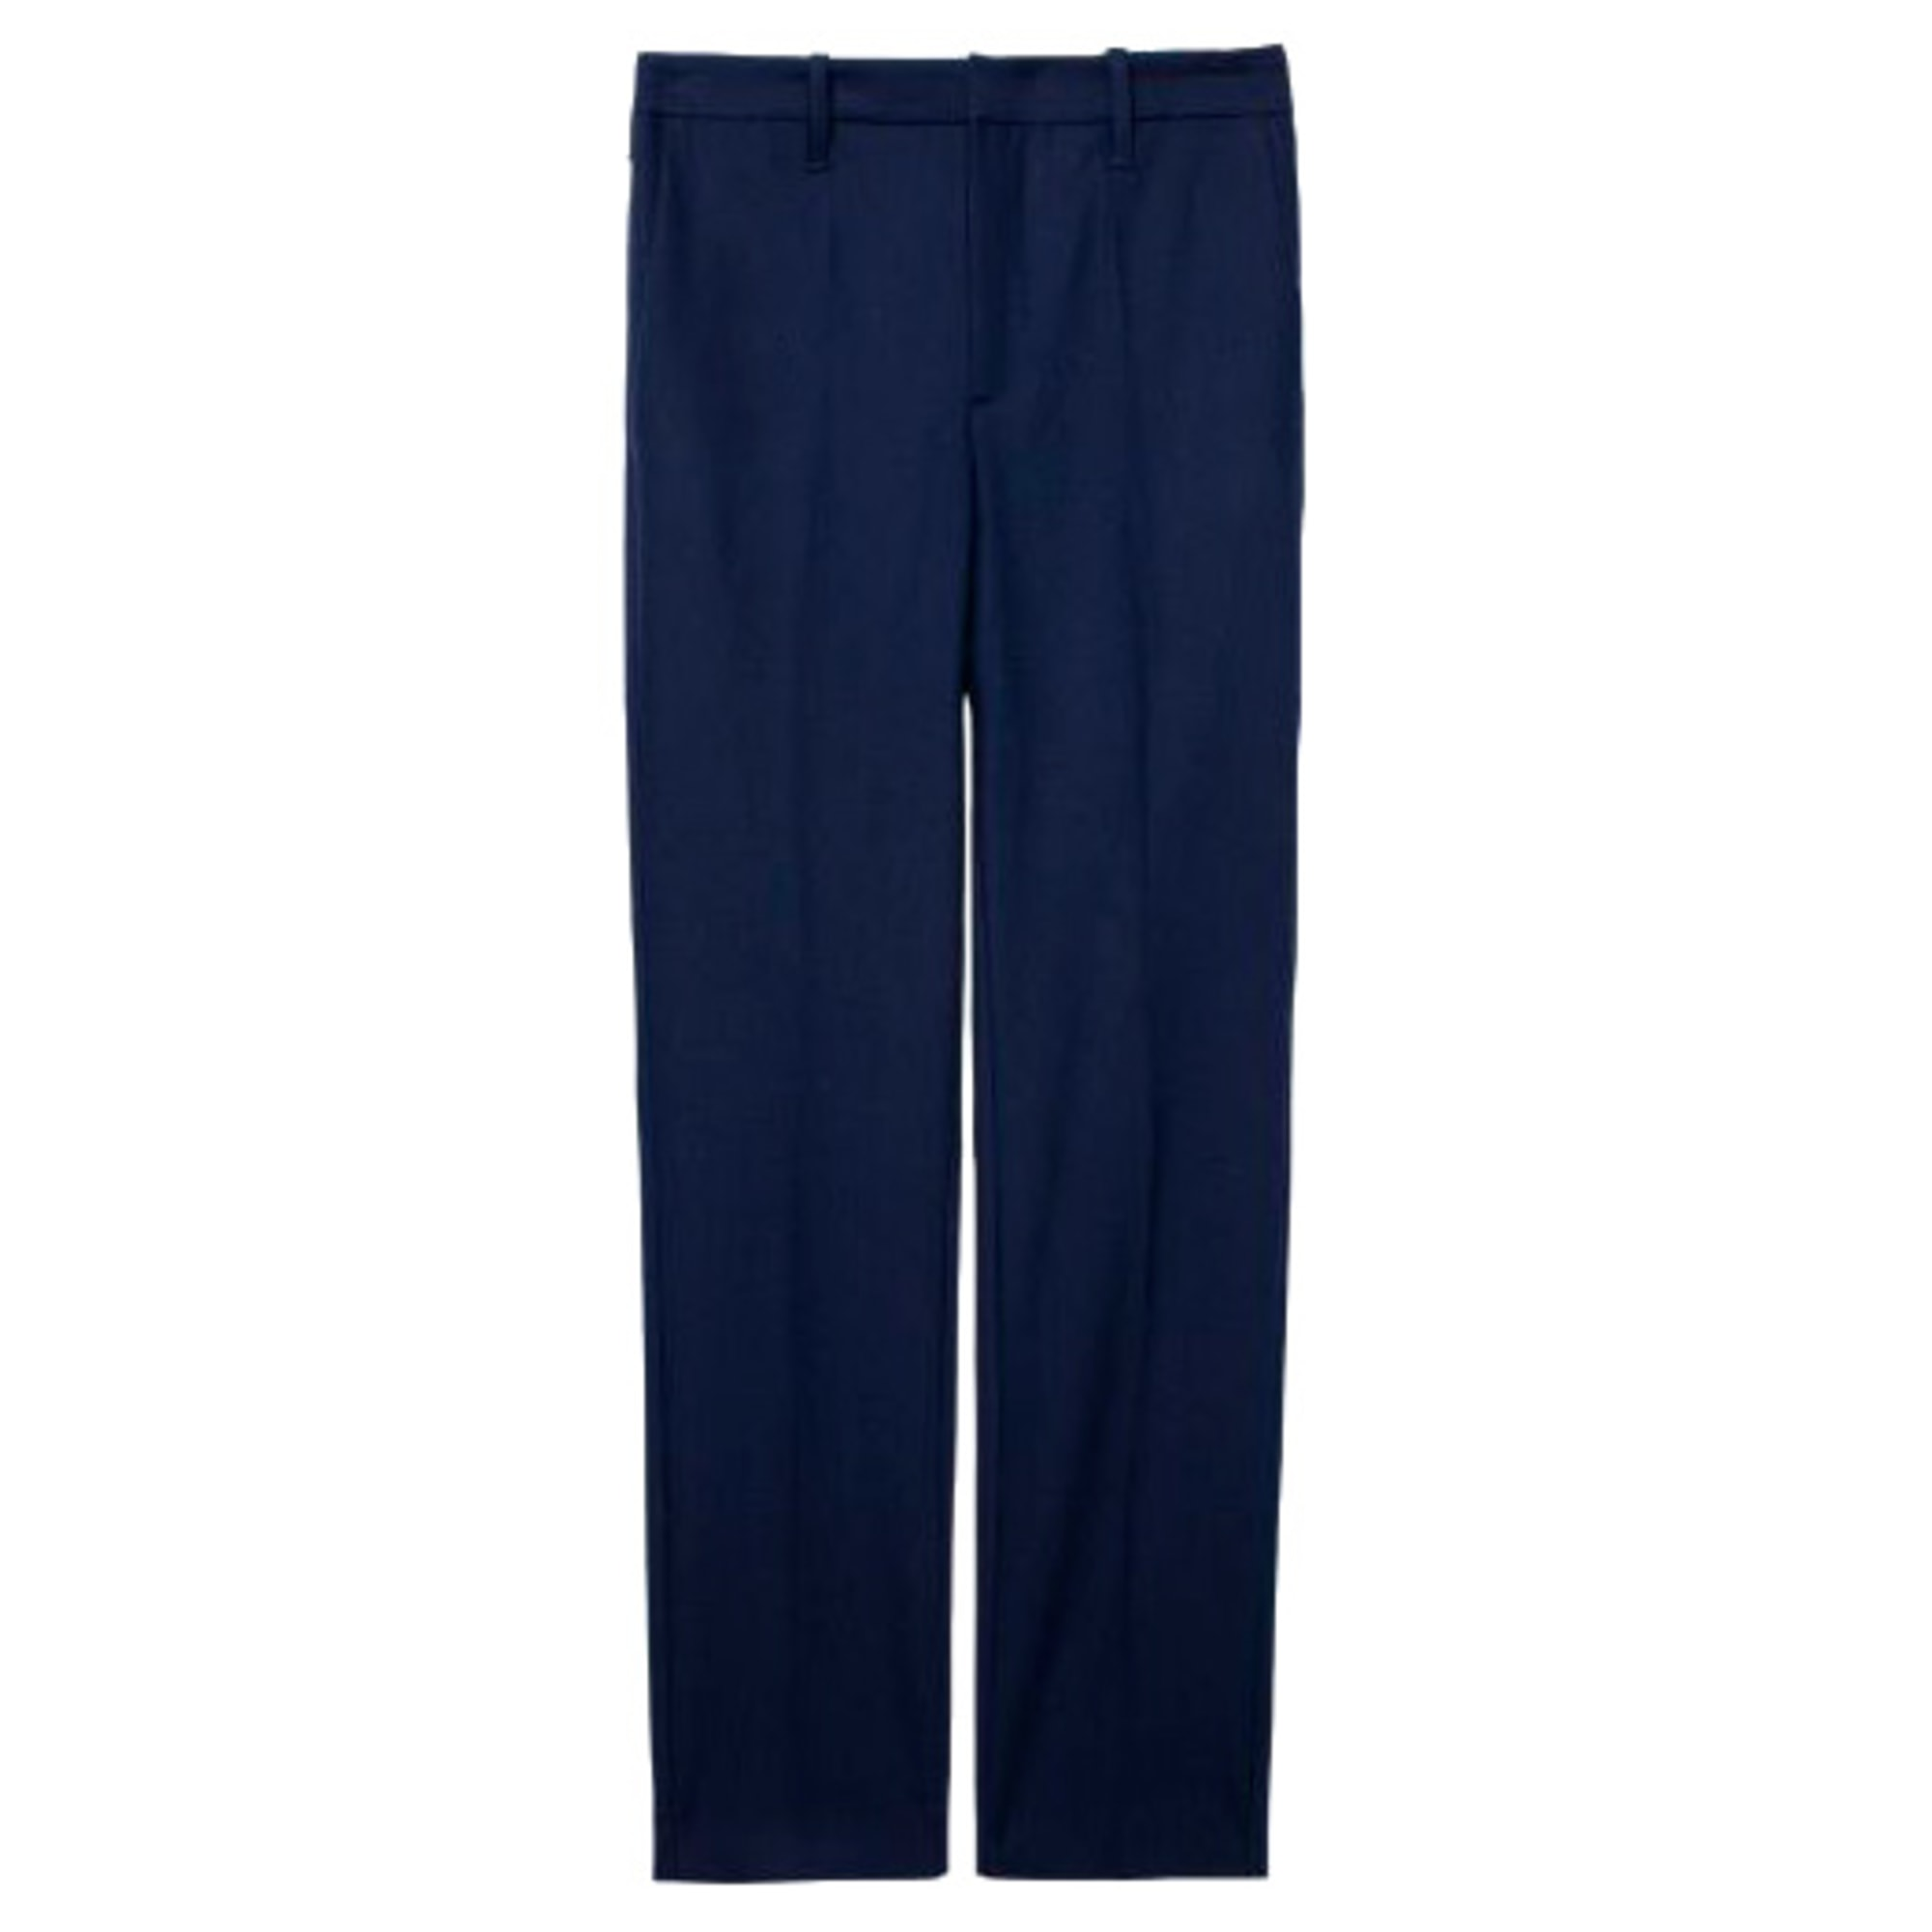 Pantalon droit ZADIG & VOLTAIRE Bleu, bleu marine, bleu turquoise